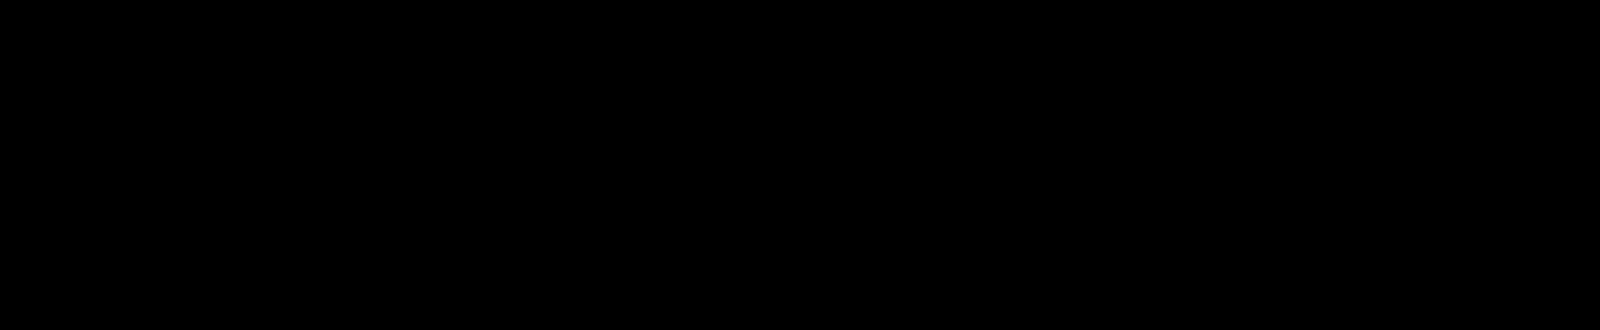 Oekeboeleke